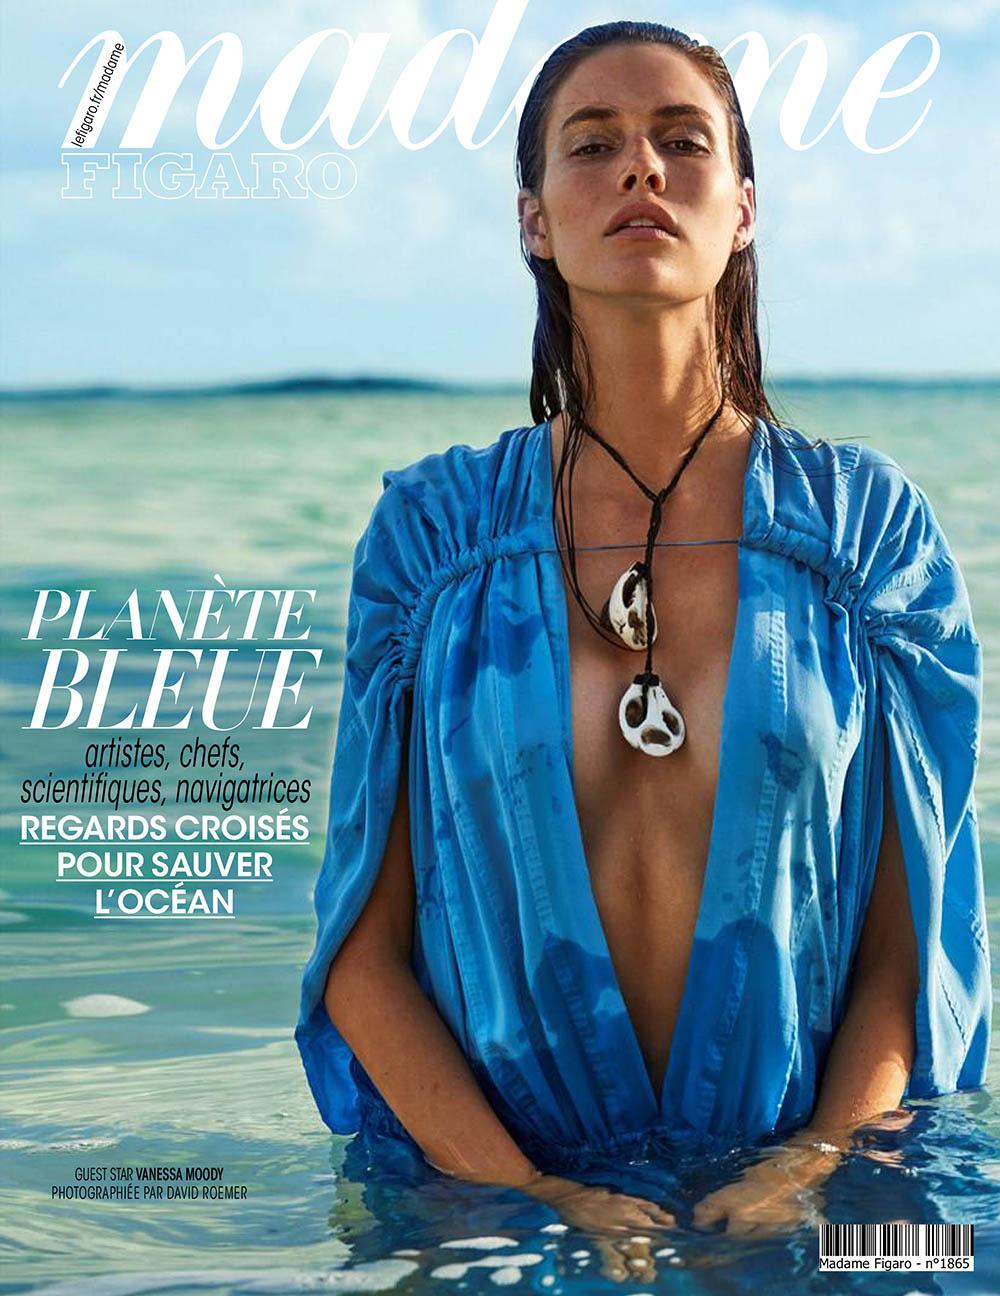 Vanessa Moody covers Madame Figaro May 22nd, 2020 by David Roemer